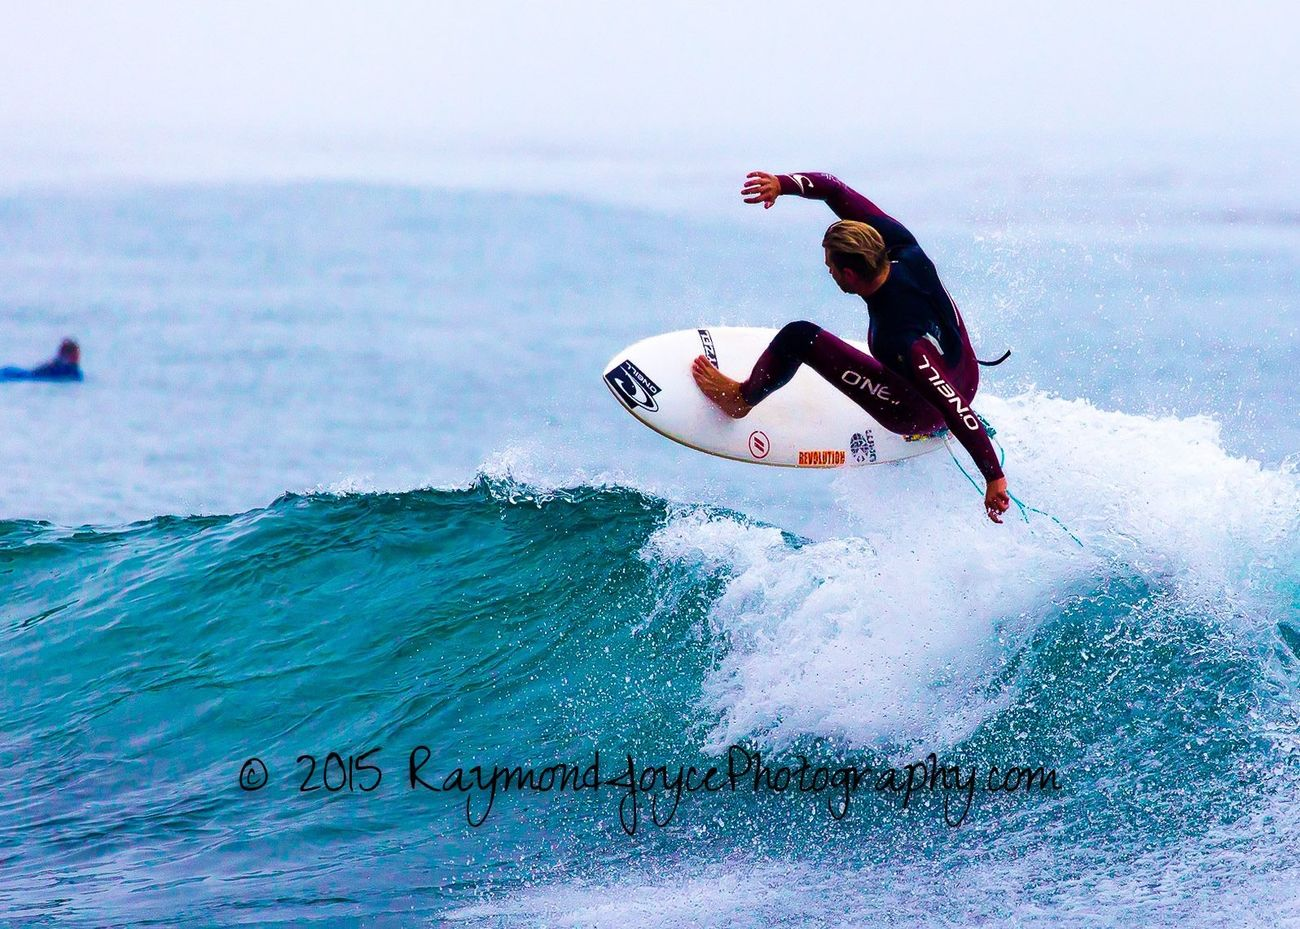 International Surfing Day International Surfing Day ISD15 Surfing Surfboard Surfer Surfingphotography Surfingiseverything Surfingmalibu Summer2015 Fun